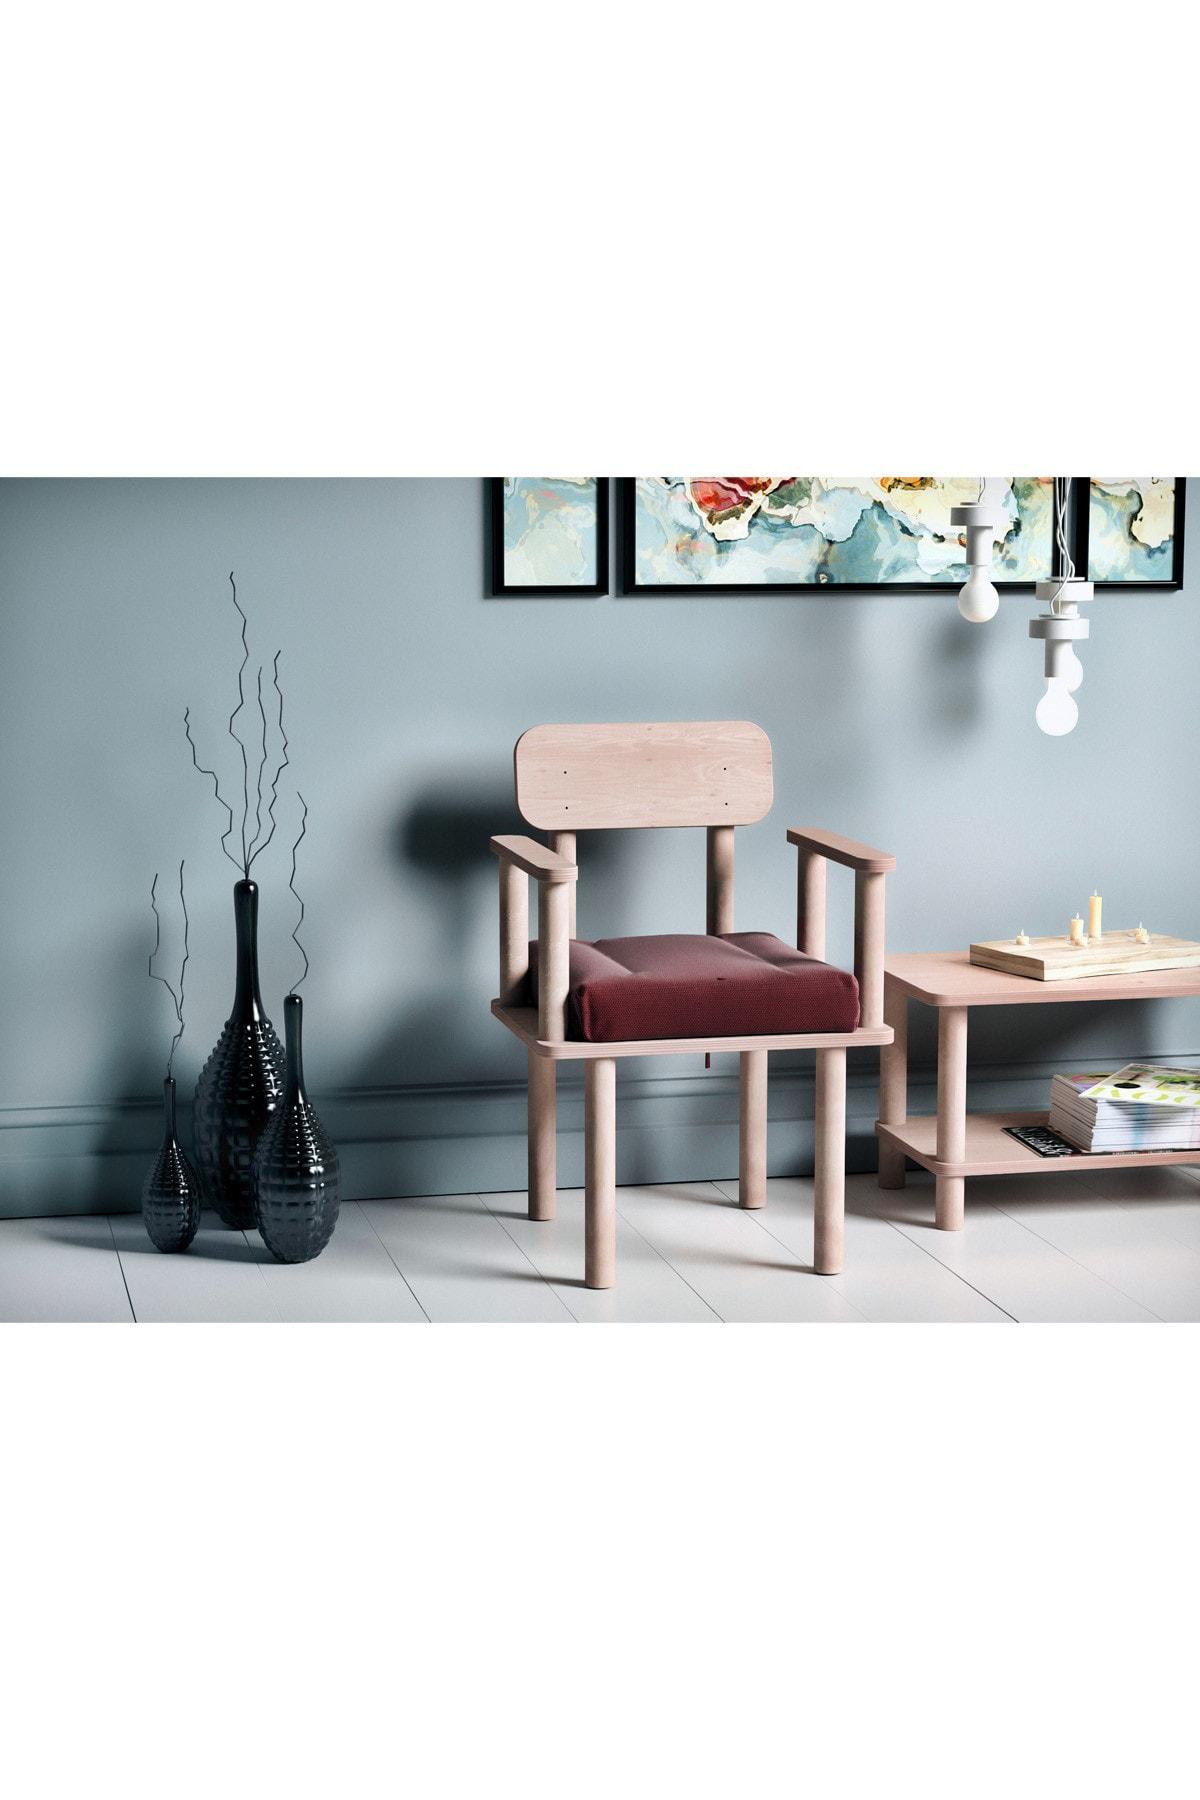 VUDIVA Magnesia Kolçaklı Sandalye Bordo